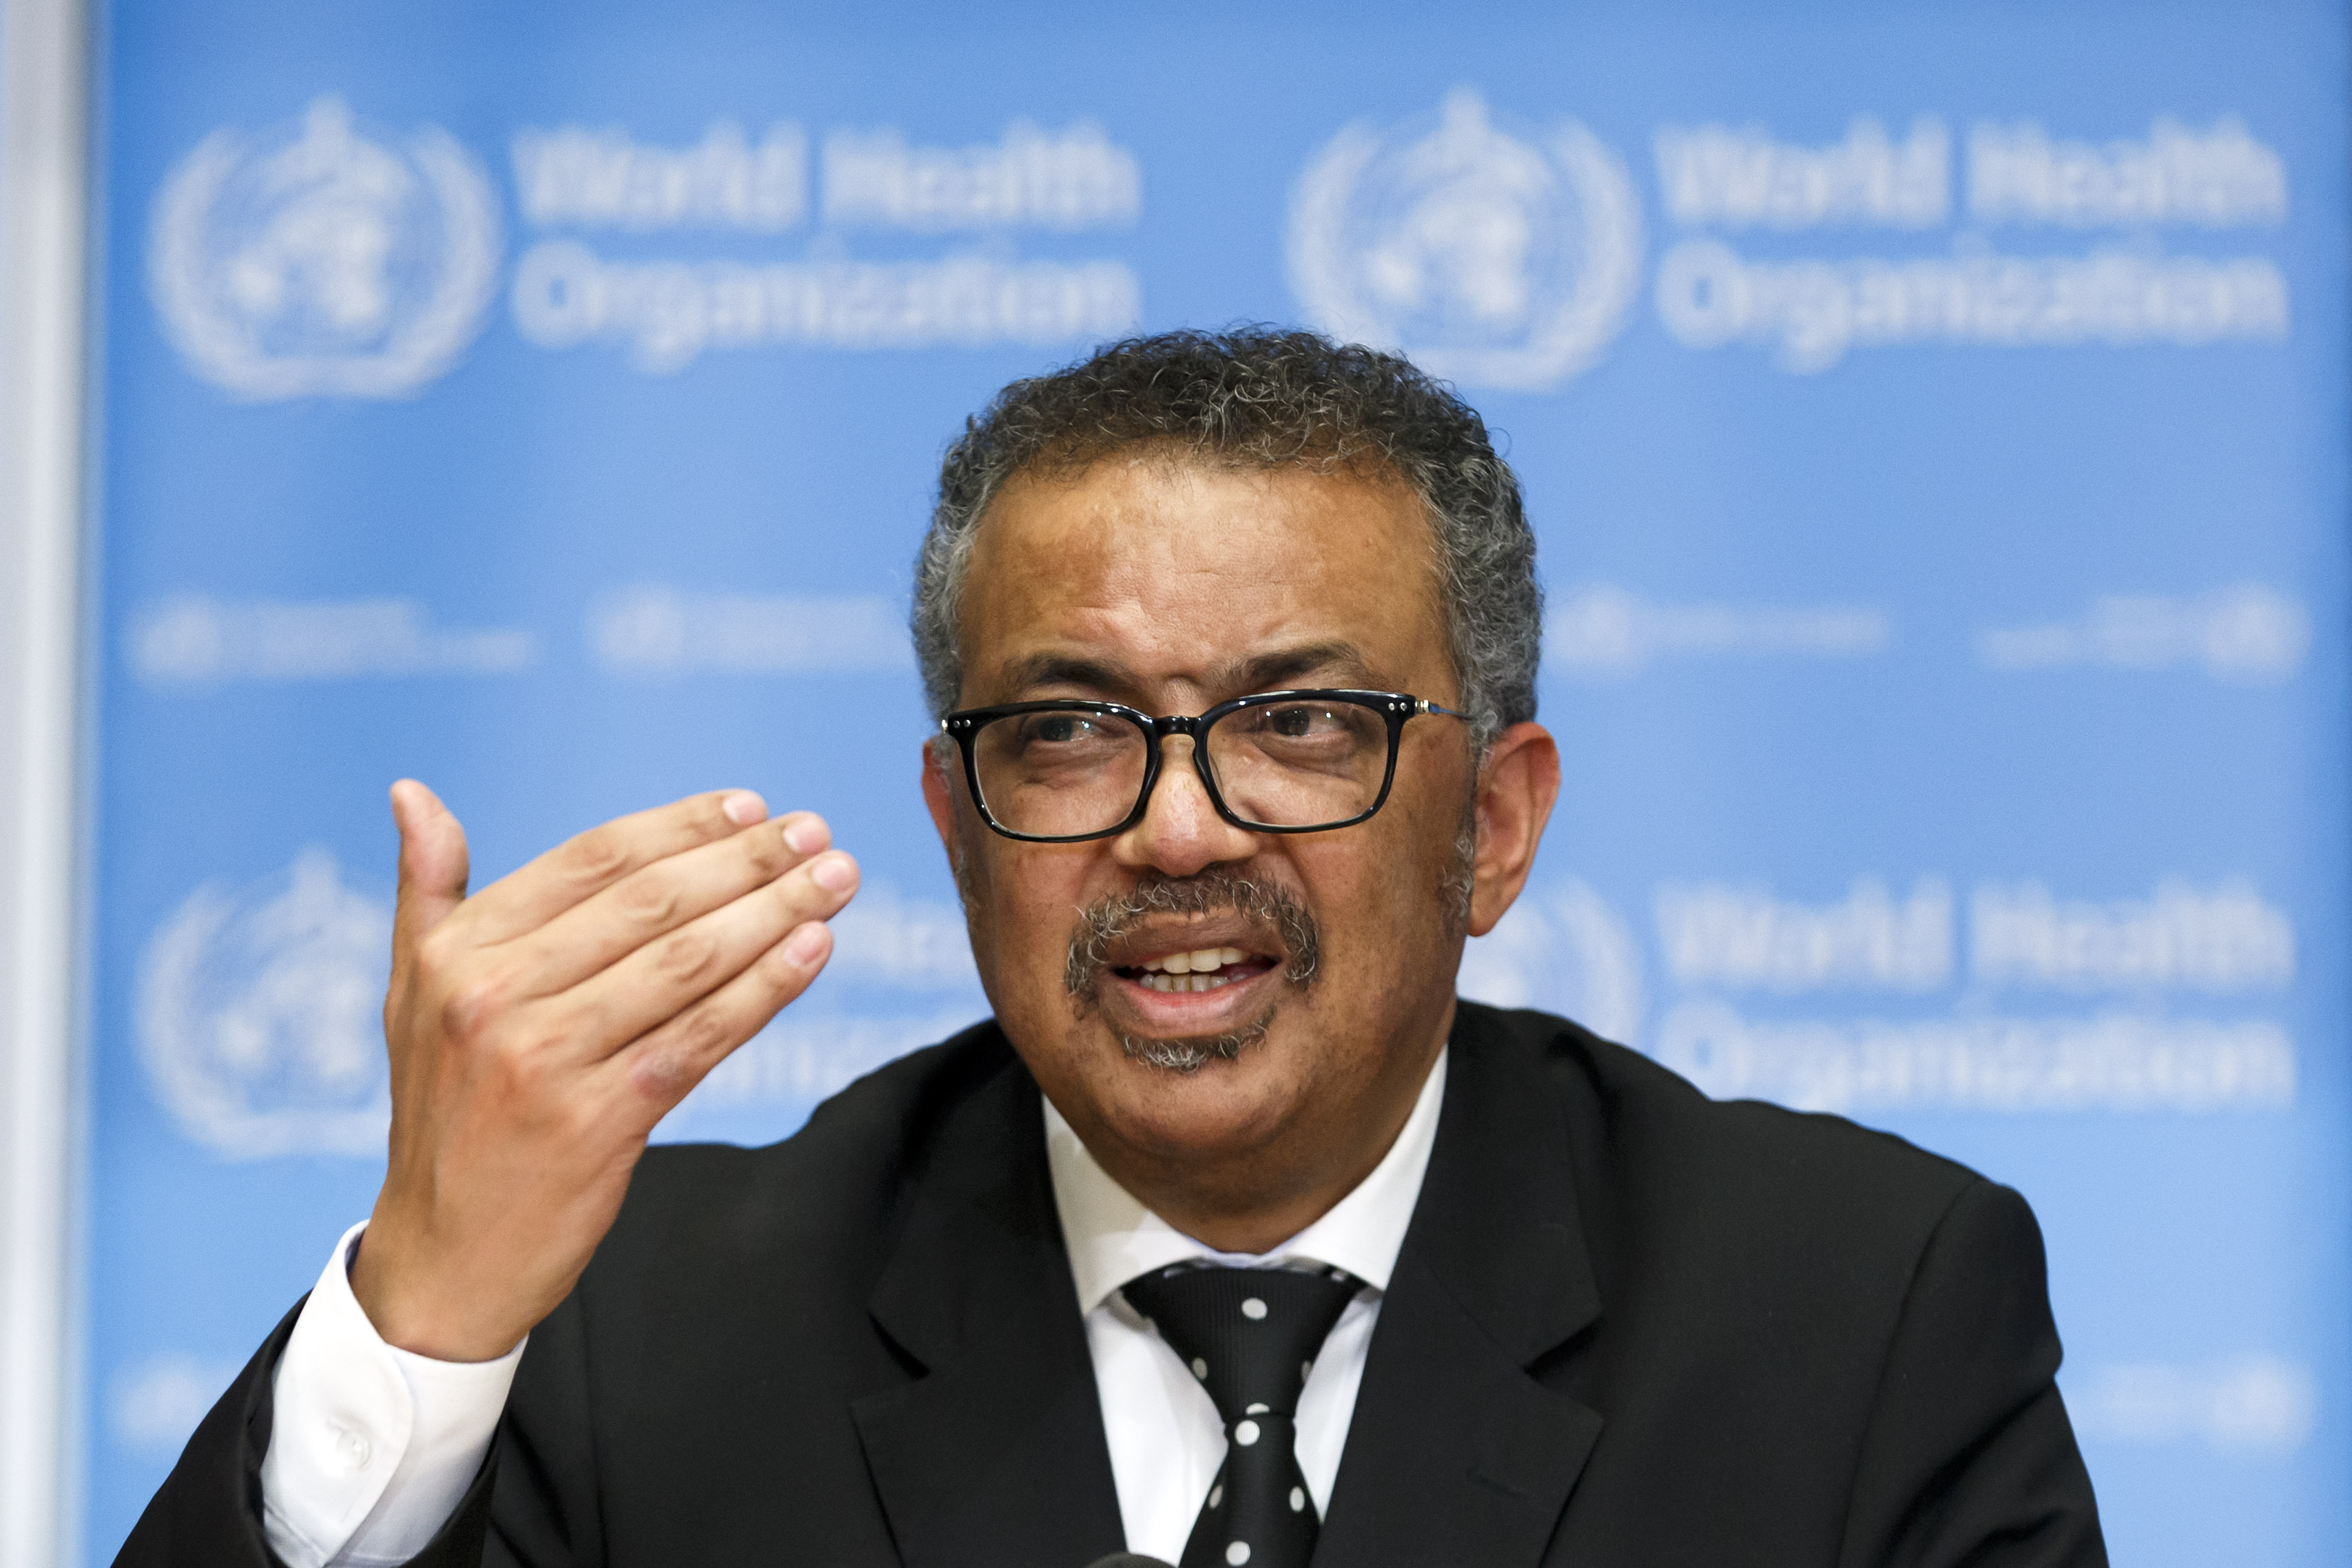 Tedros Adhanom Ghebreyesus, Director General of the World Health Organization